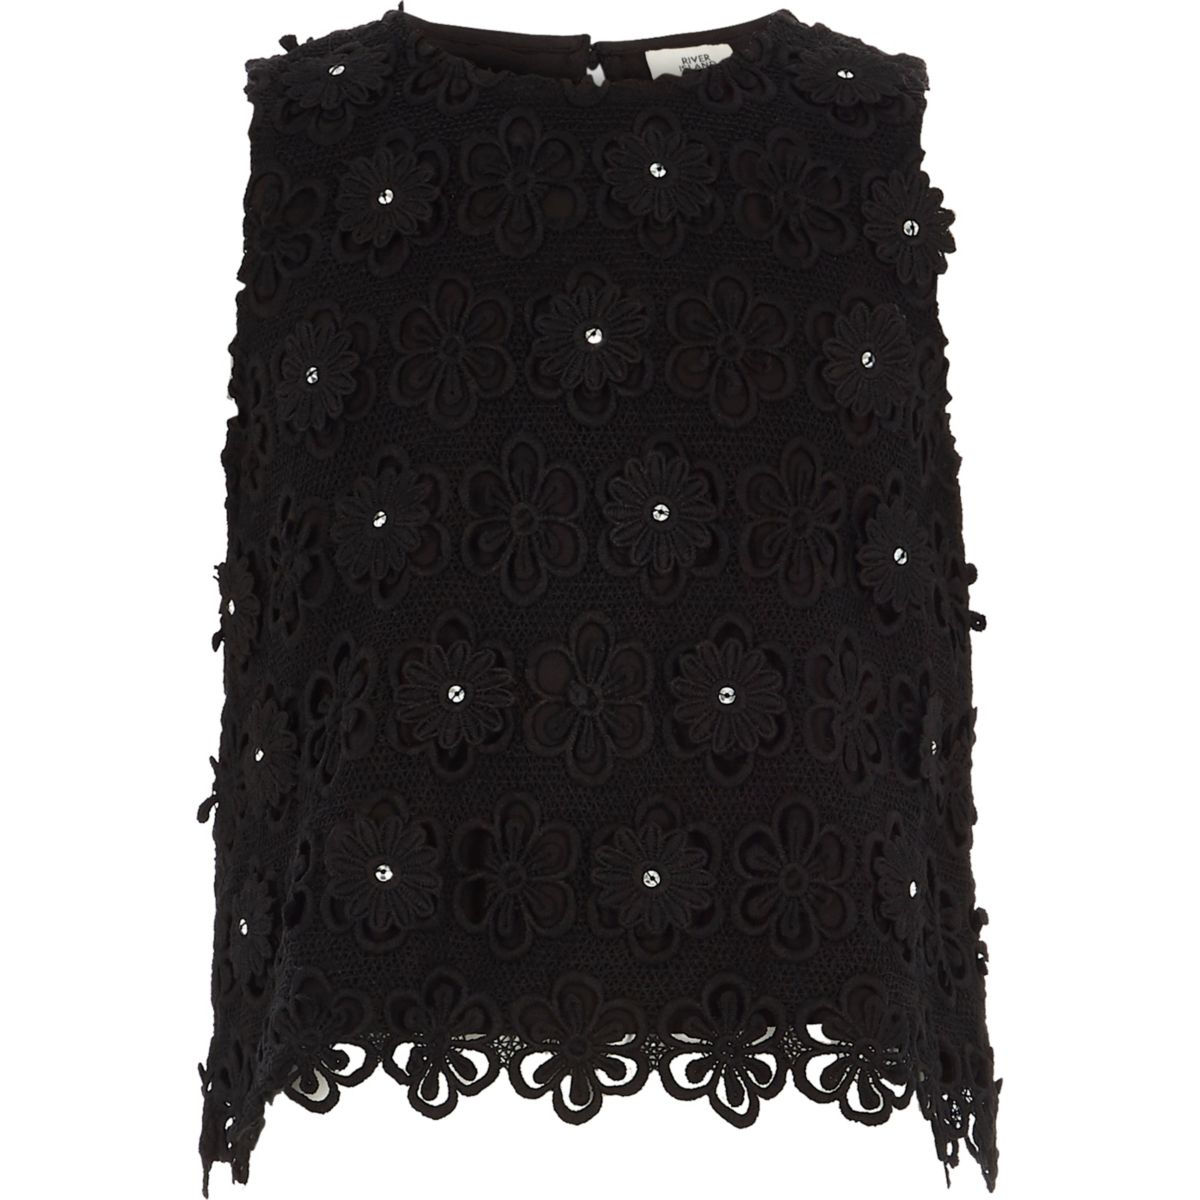 Girls black lace embellished shell top